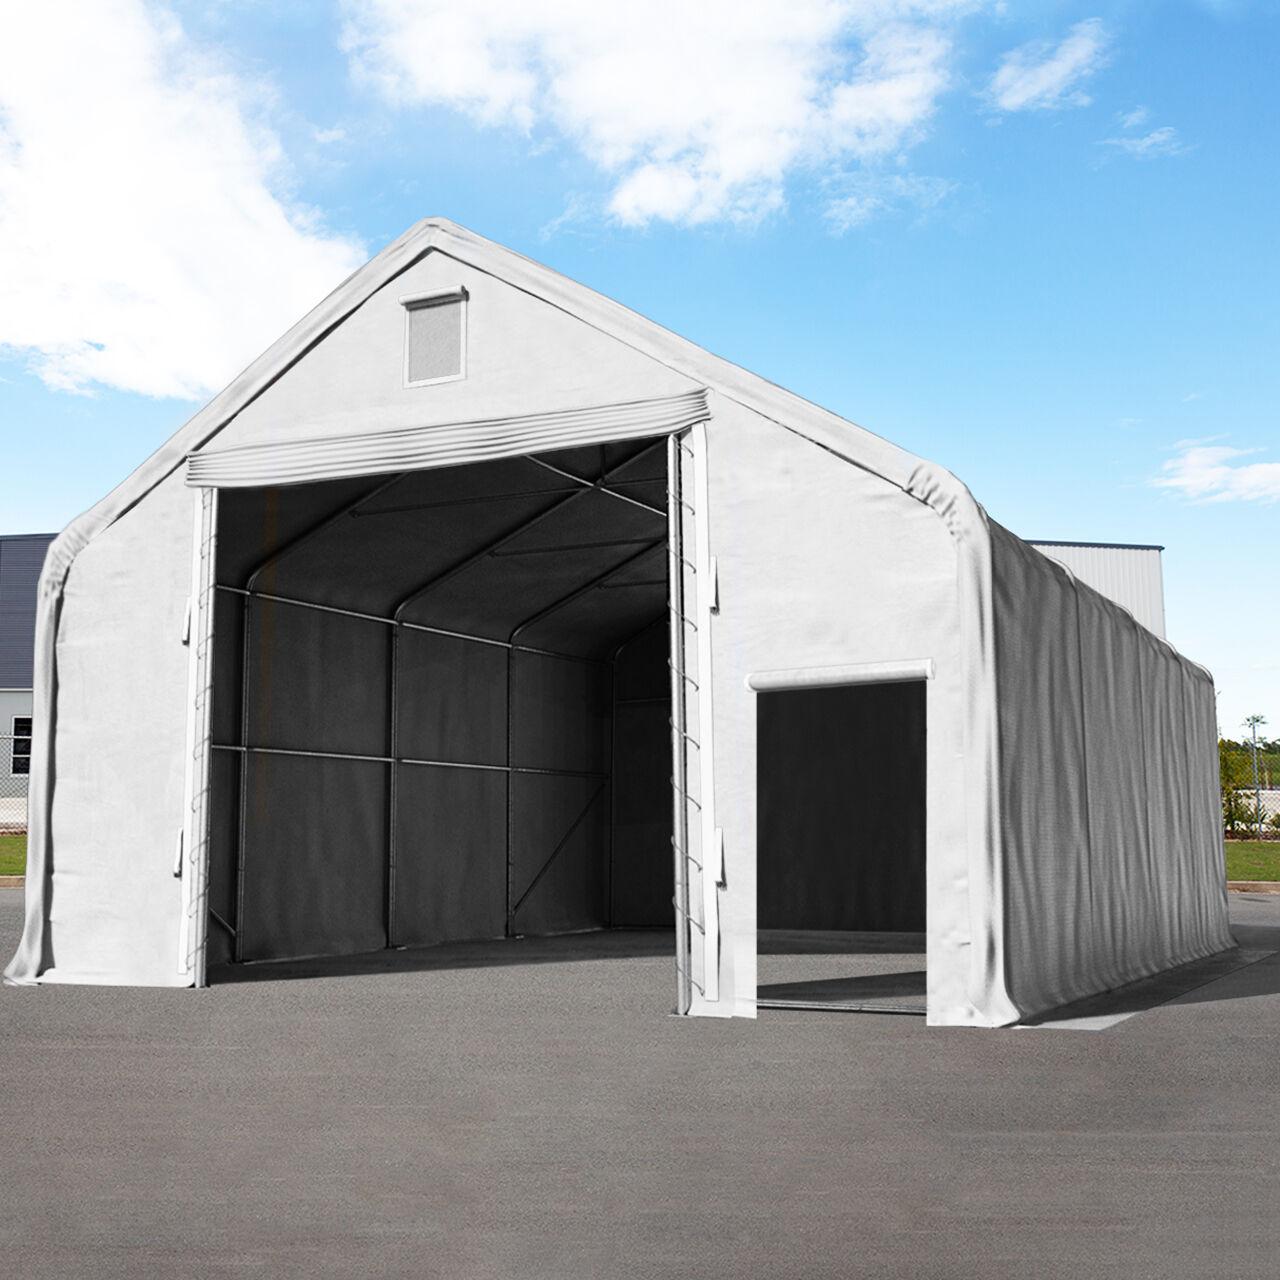 TOOLPORT Industrial Tent 8x16m PVC 720 g/m² grey waterproof